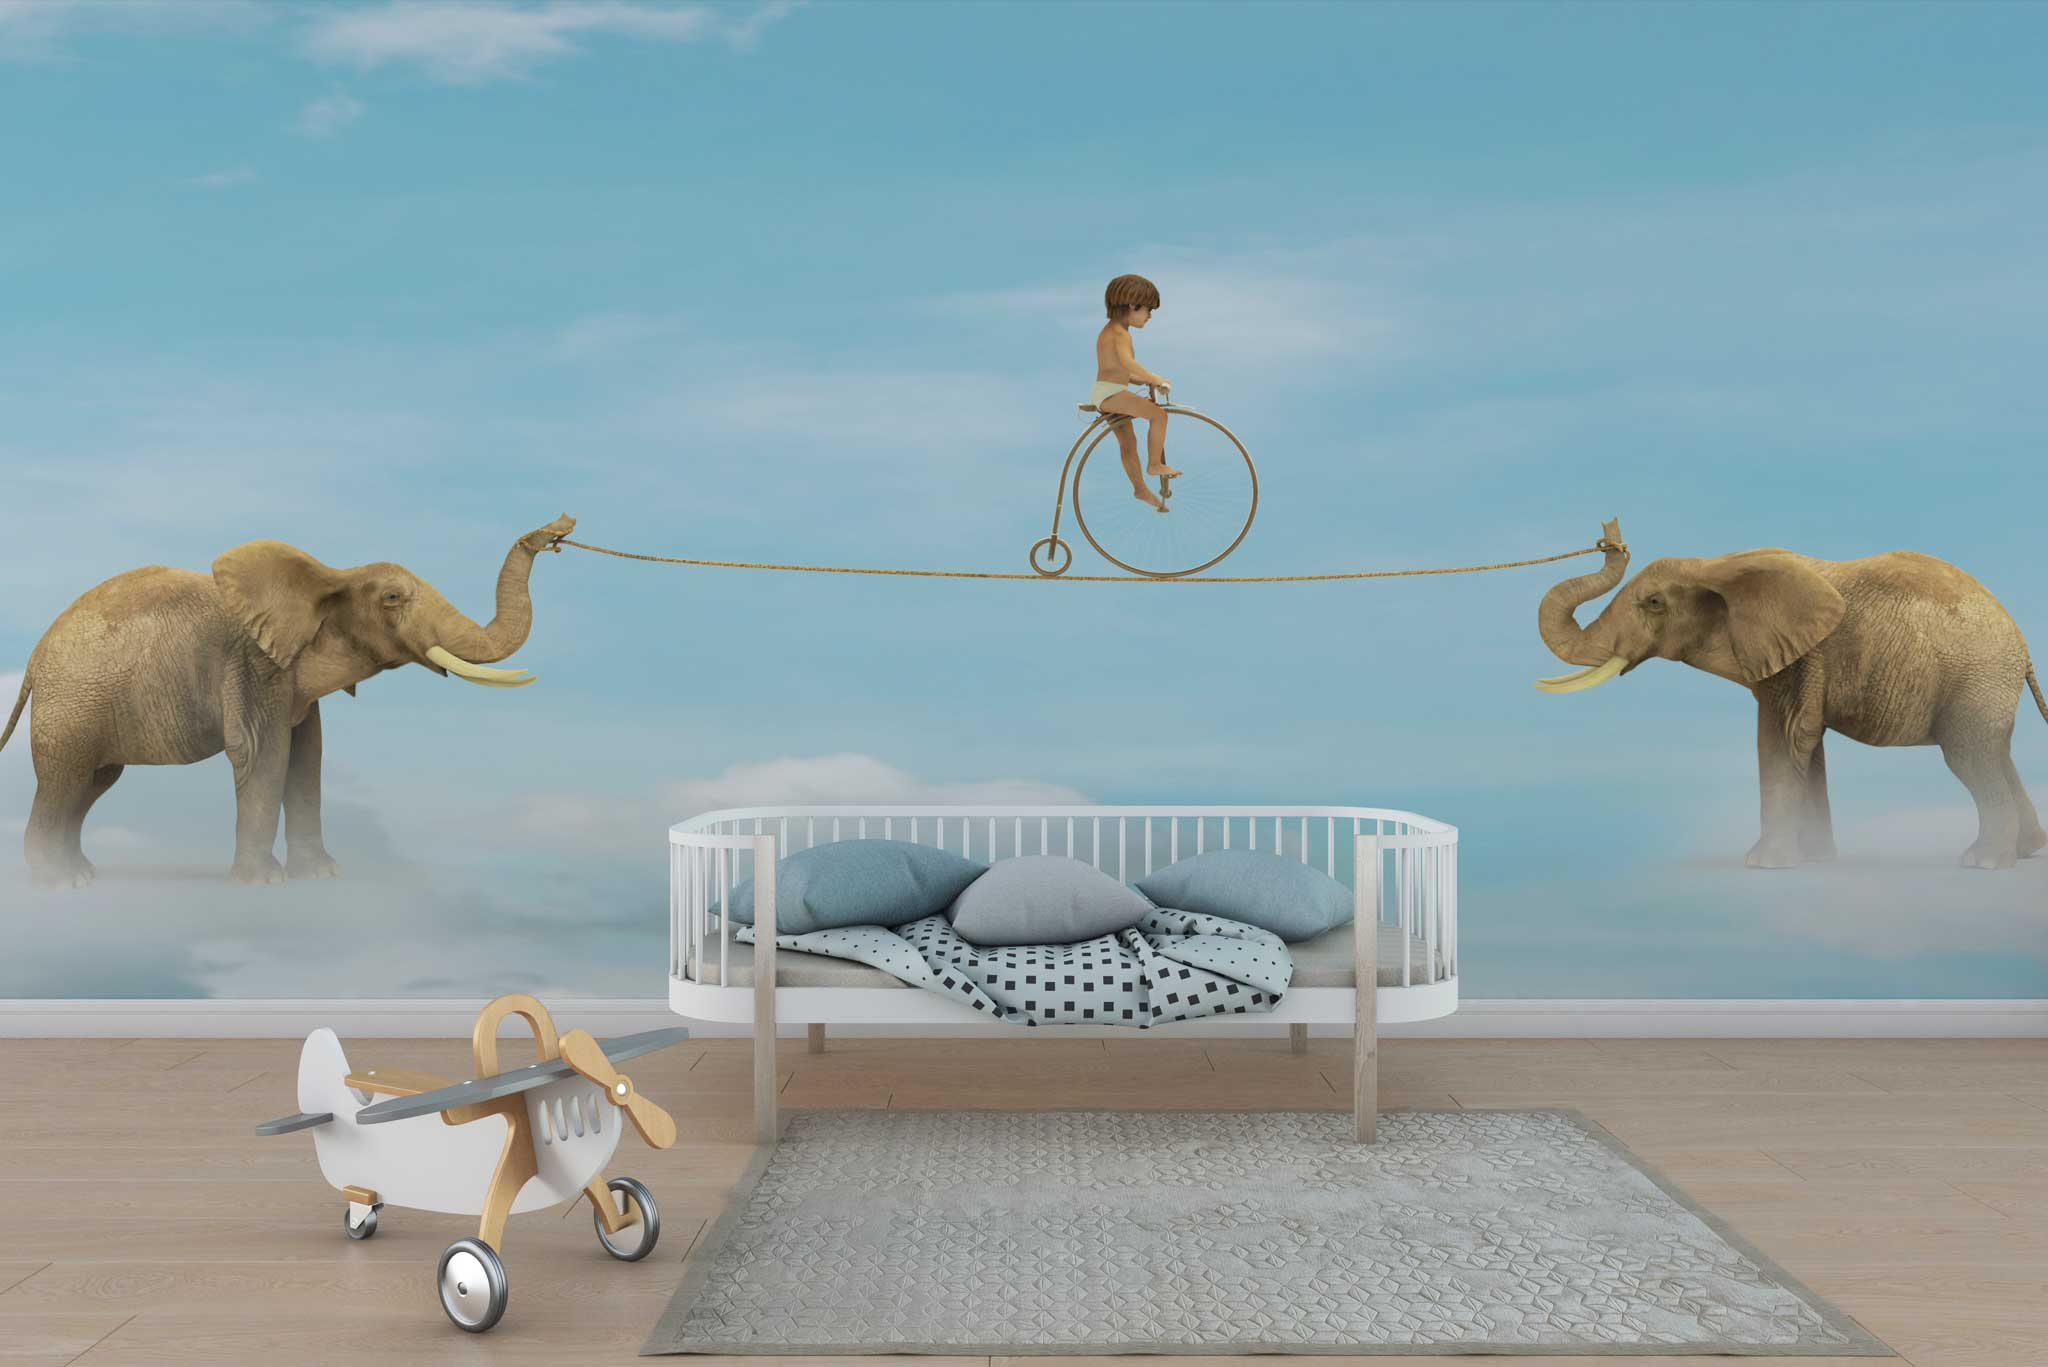 tapet-fototapet-design-personalizat-customizabil-comanda-special-camera-dormitor-copii-model-fantastic-vis-cer-senin-elefanti-baietel-bicicleta-sarma-albastru